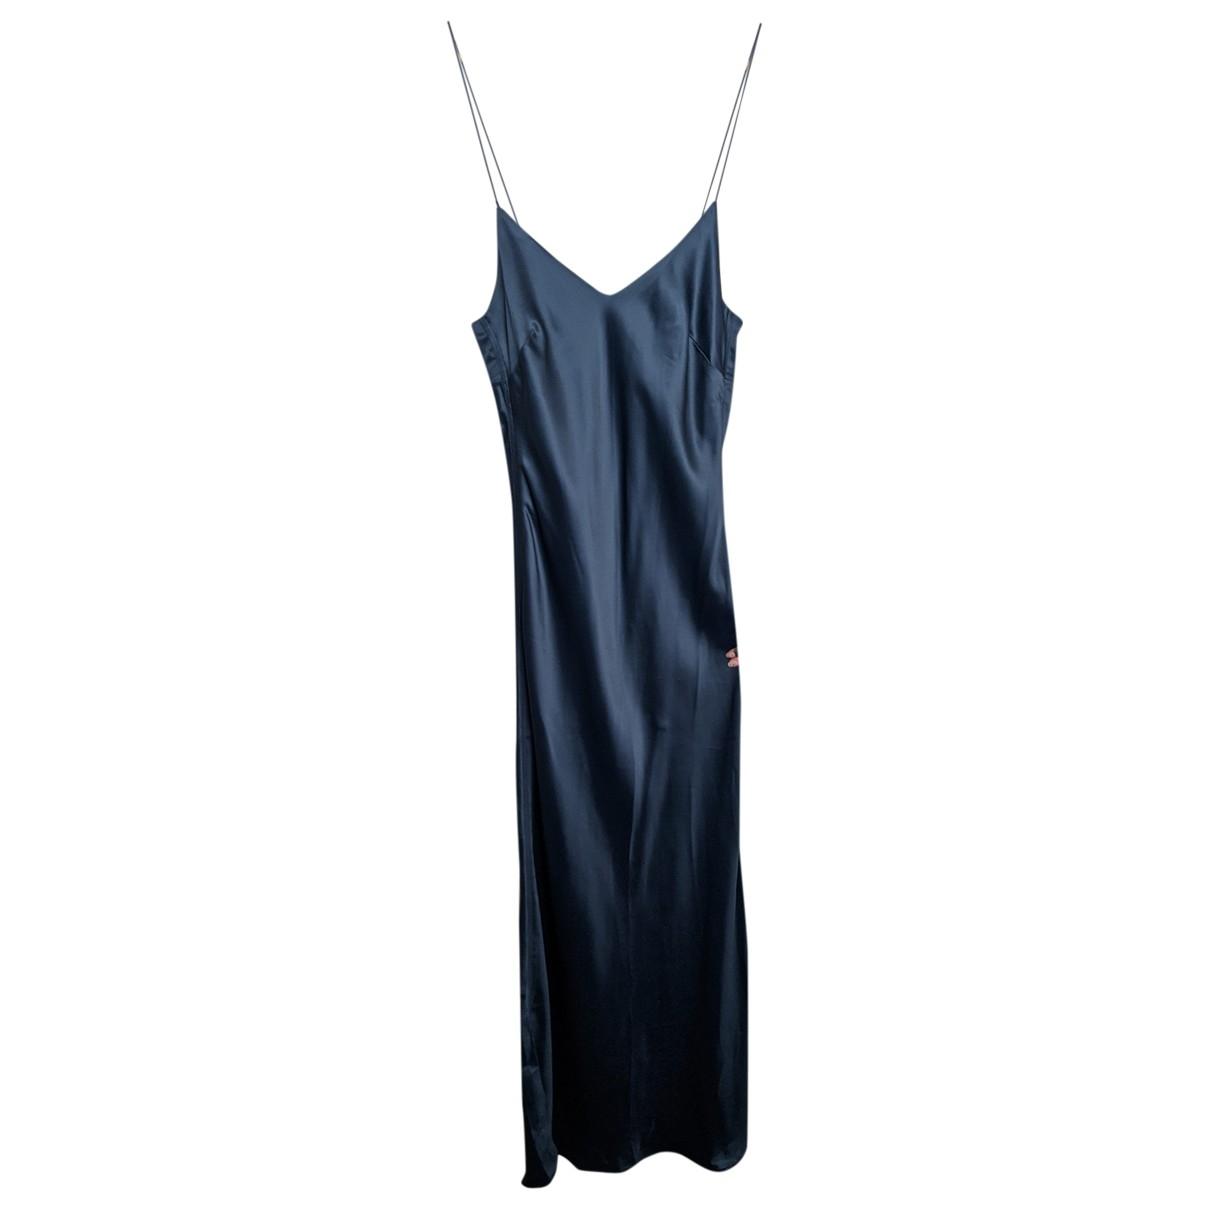 Études Studio \N Blue dress for Women 36 FR